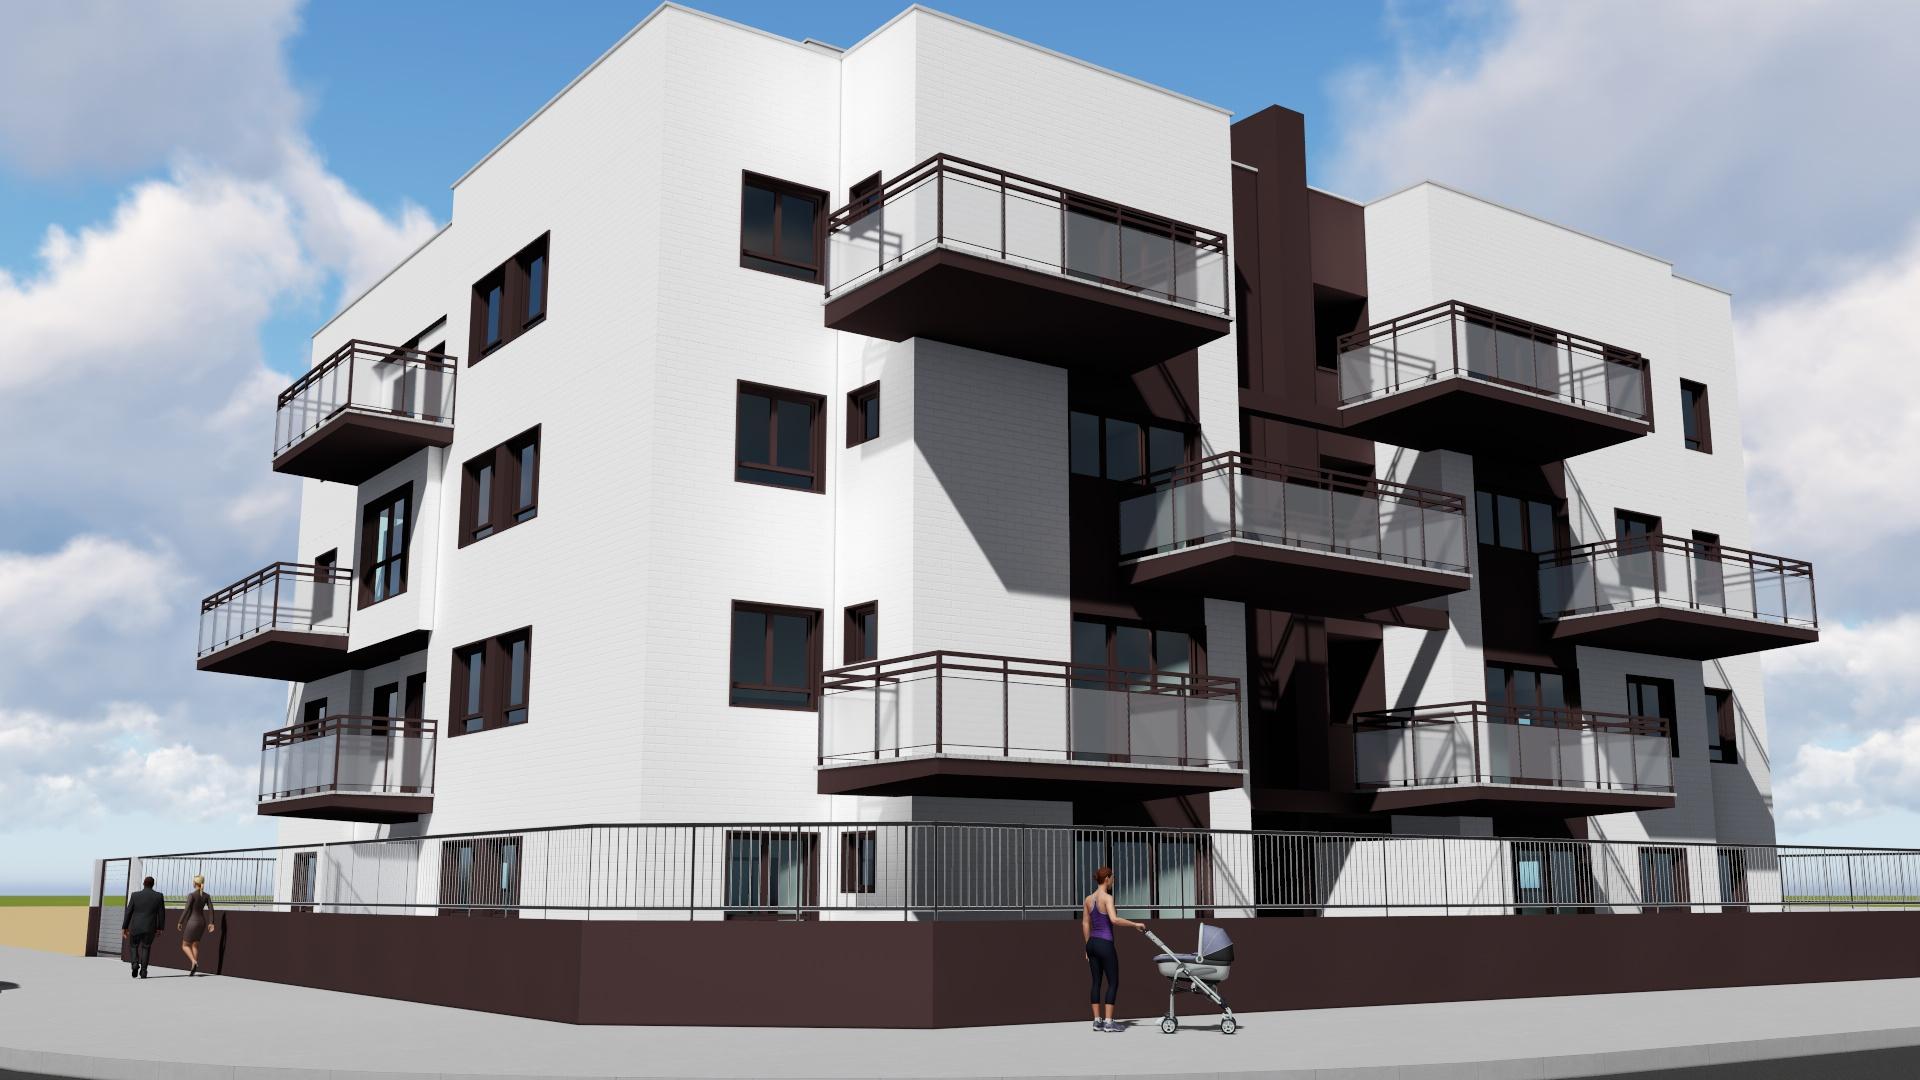 Vivienda en Albacete Barrio Imaginalia